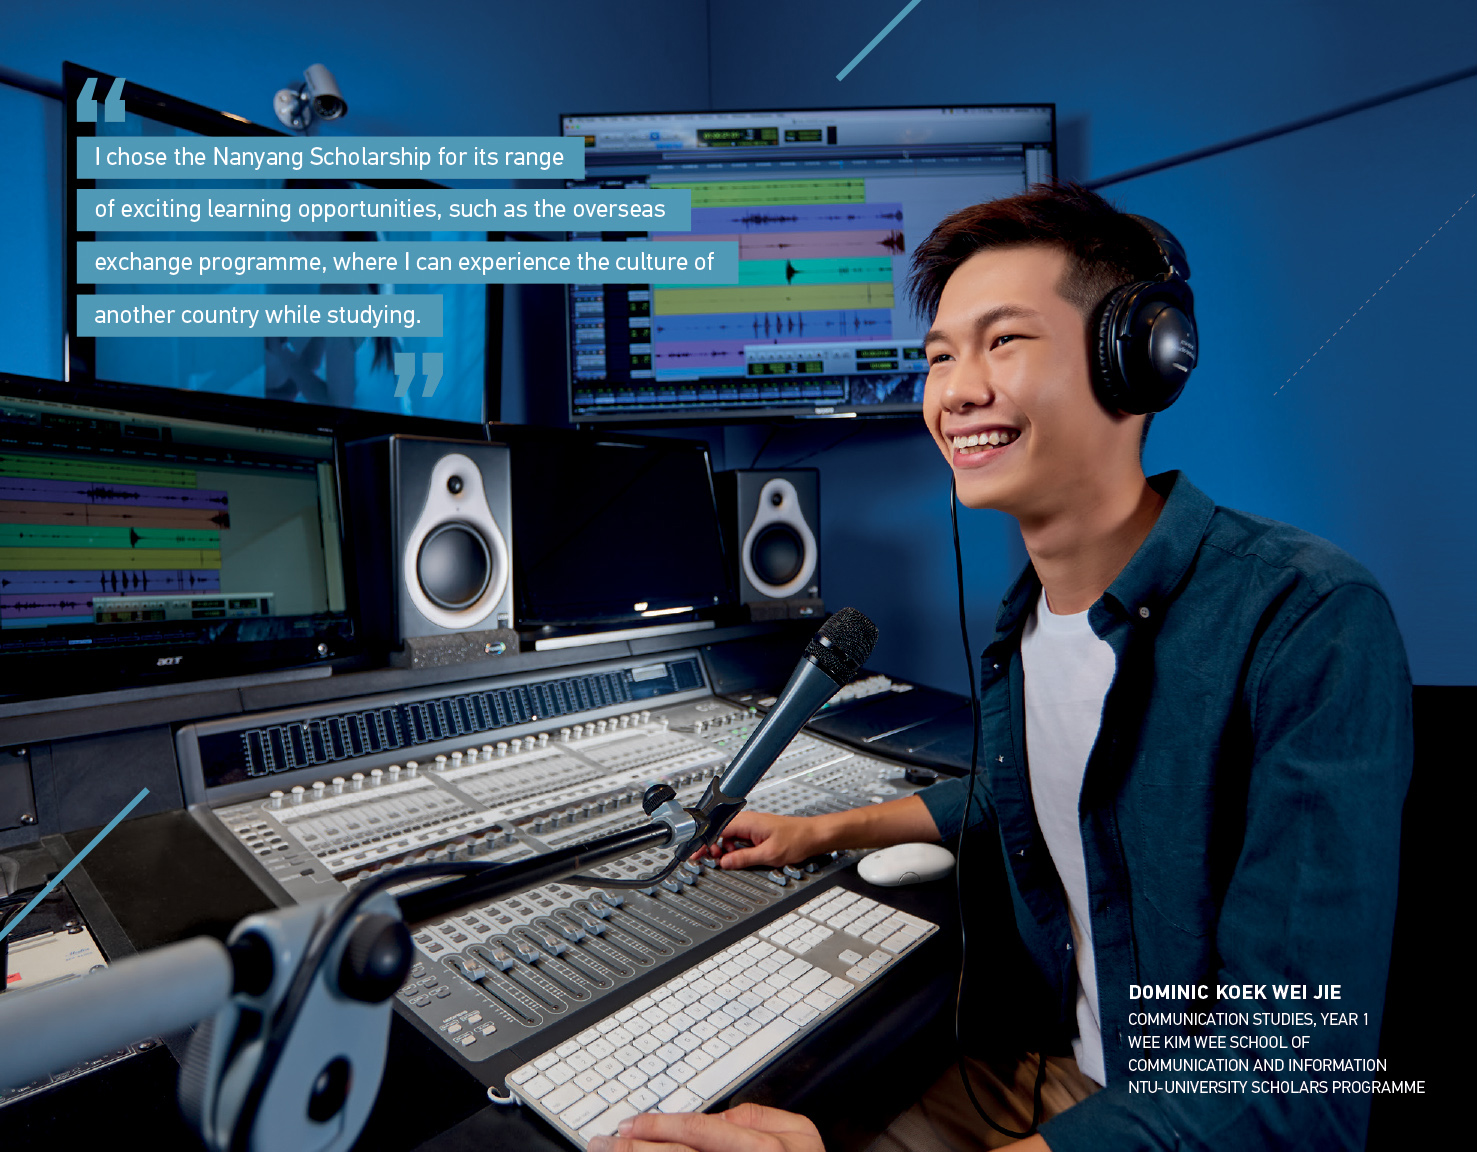 Corporate-Lifestyle-Photography-Singapore-NTU-4